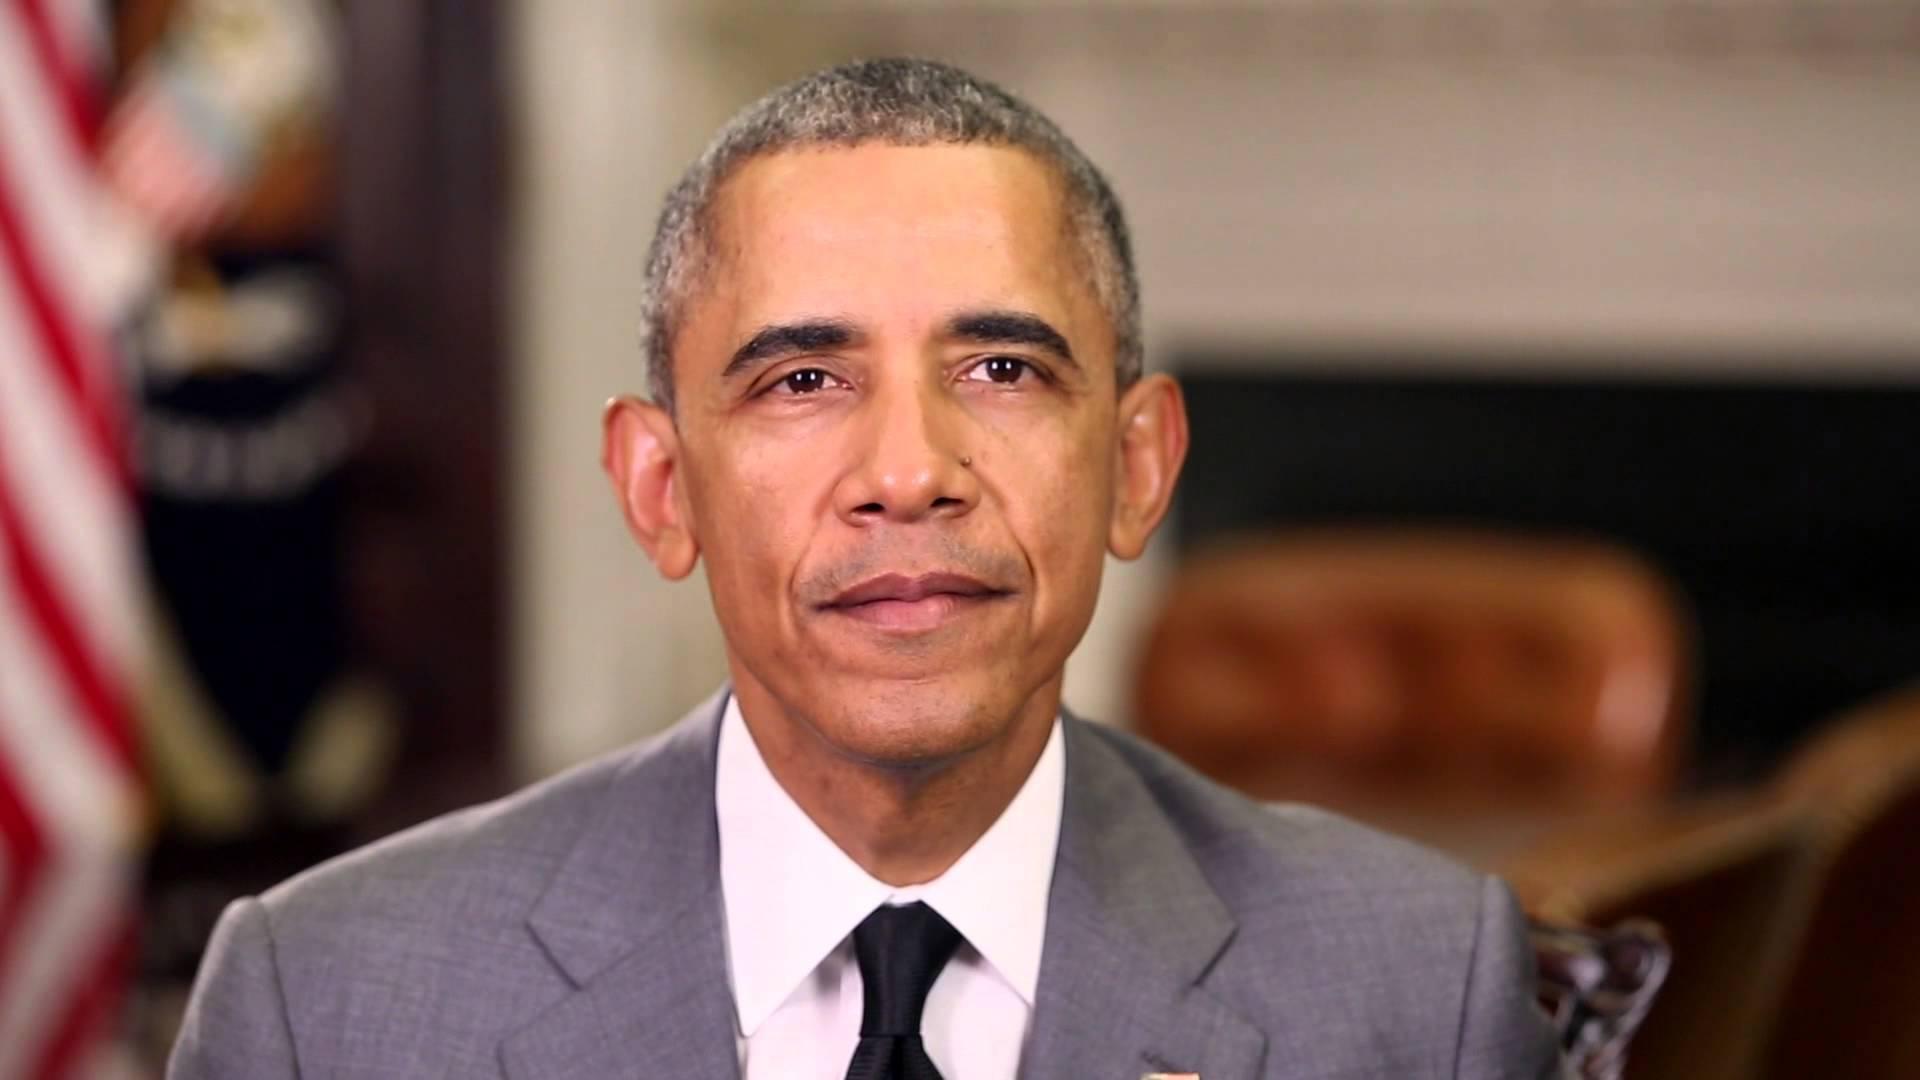 a biography of barack hussein obama Barack obama sr was born on june 18, 1936 in nyangoma-kogela, kenya as barack hussein obama he was married to jael otieno, ruth beatrice baker.